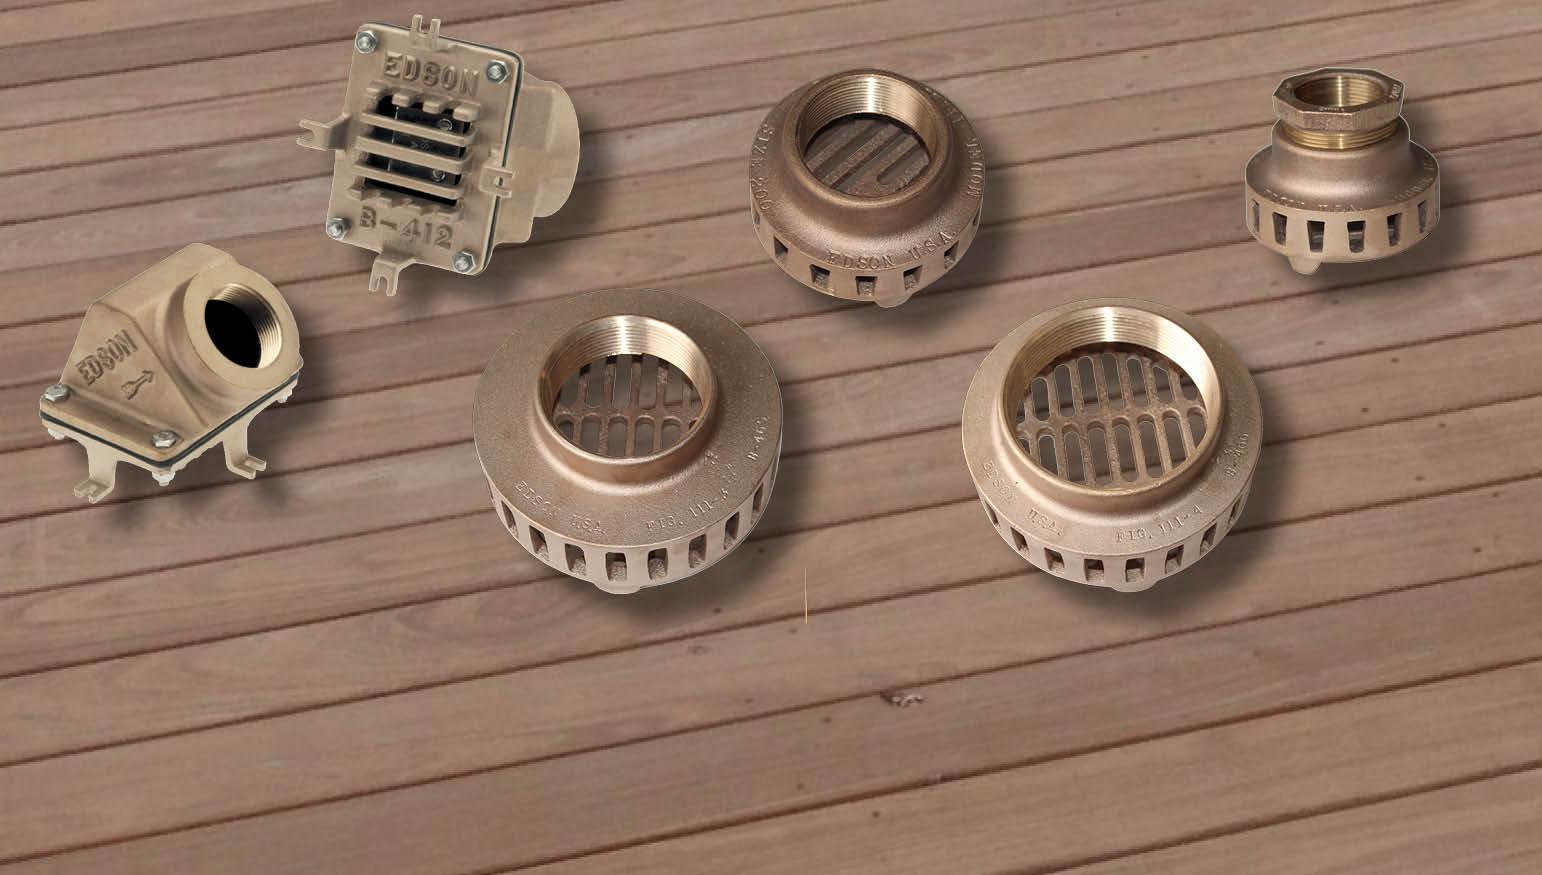 top-banner-acc-fittings-hosesfittingsacc-bronze-strainers-foot-valves-lg-.jpg